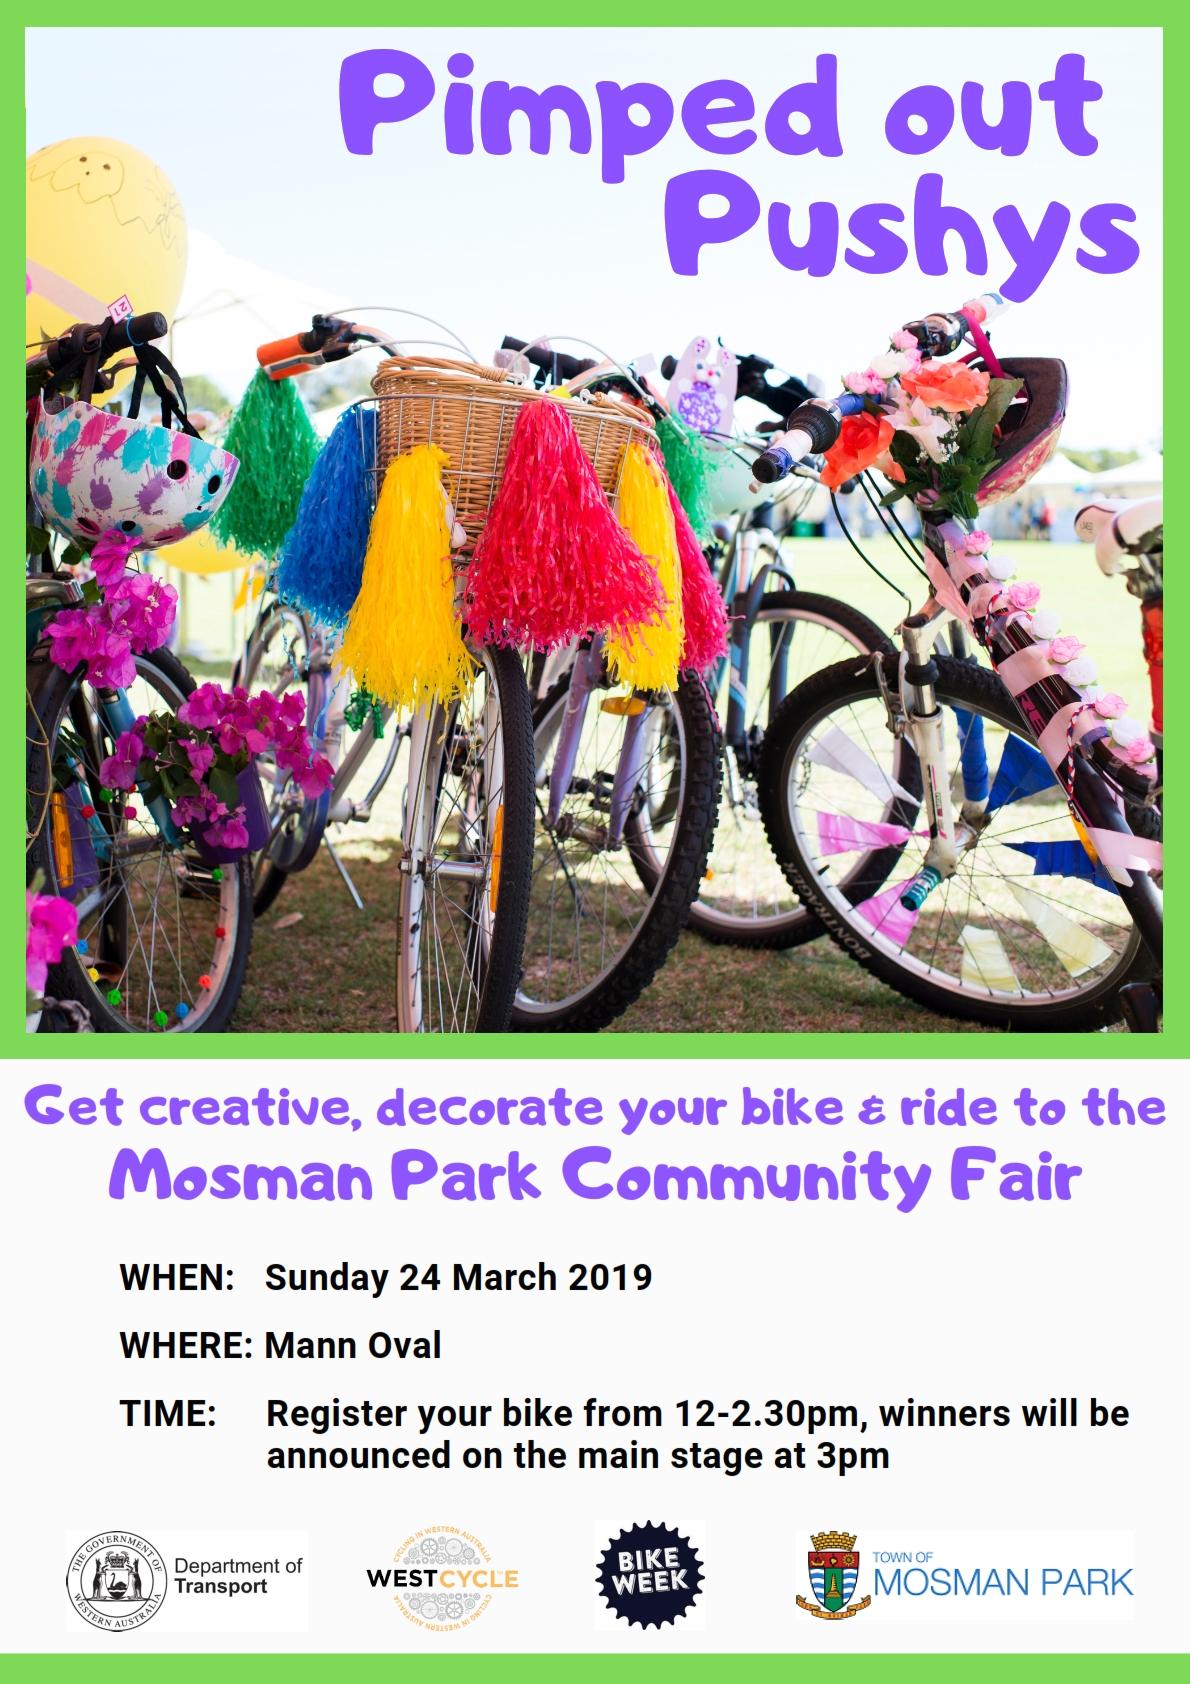 Town of Mosman Park - Pimped Out Pushys Poster 2019.jpg